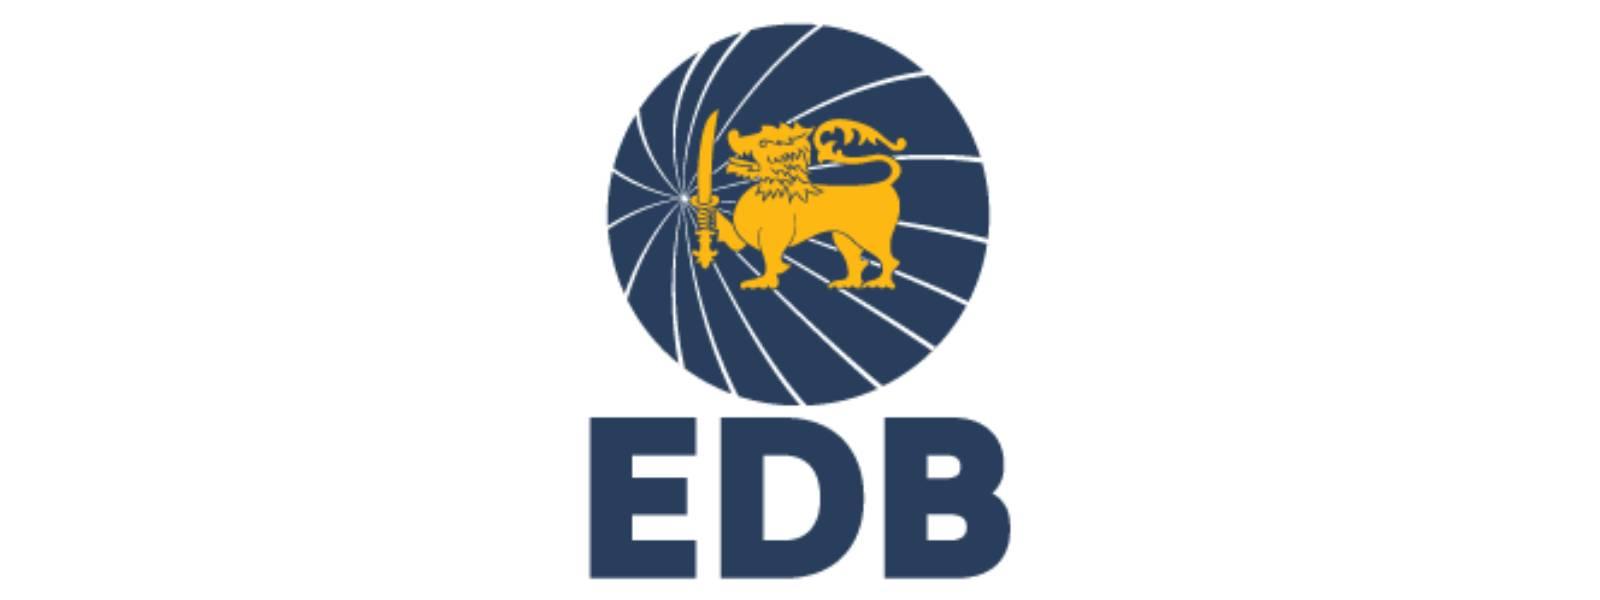 Continue operations amidst COVID-19; EDB tells businesses